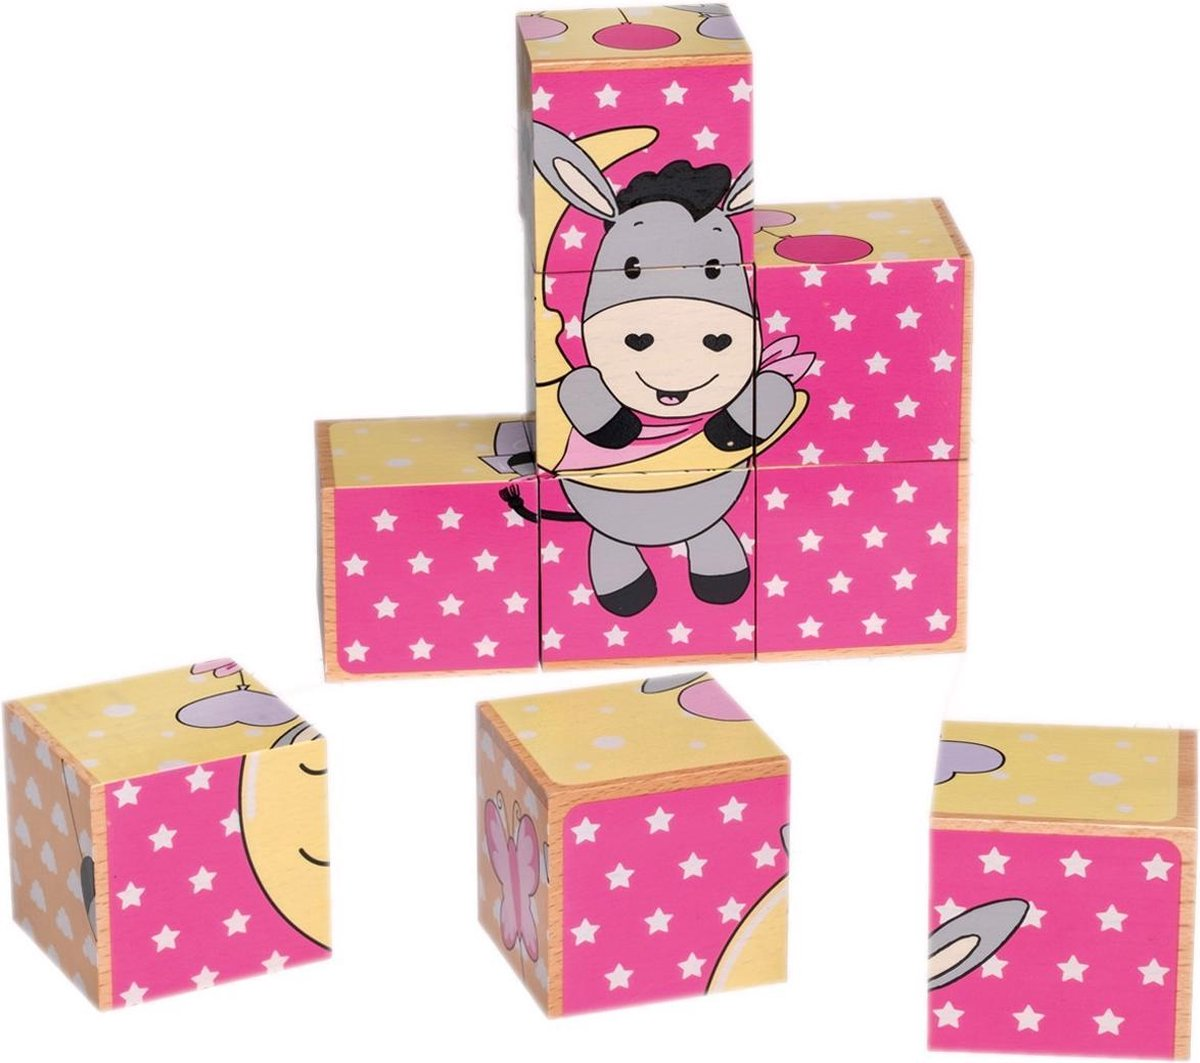 Happy People Houten Puzzelblokken Ezel 9-delig 14 Cm Roze